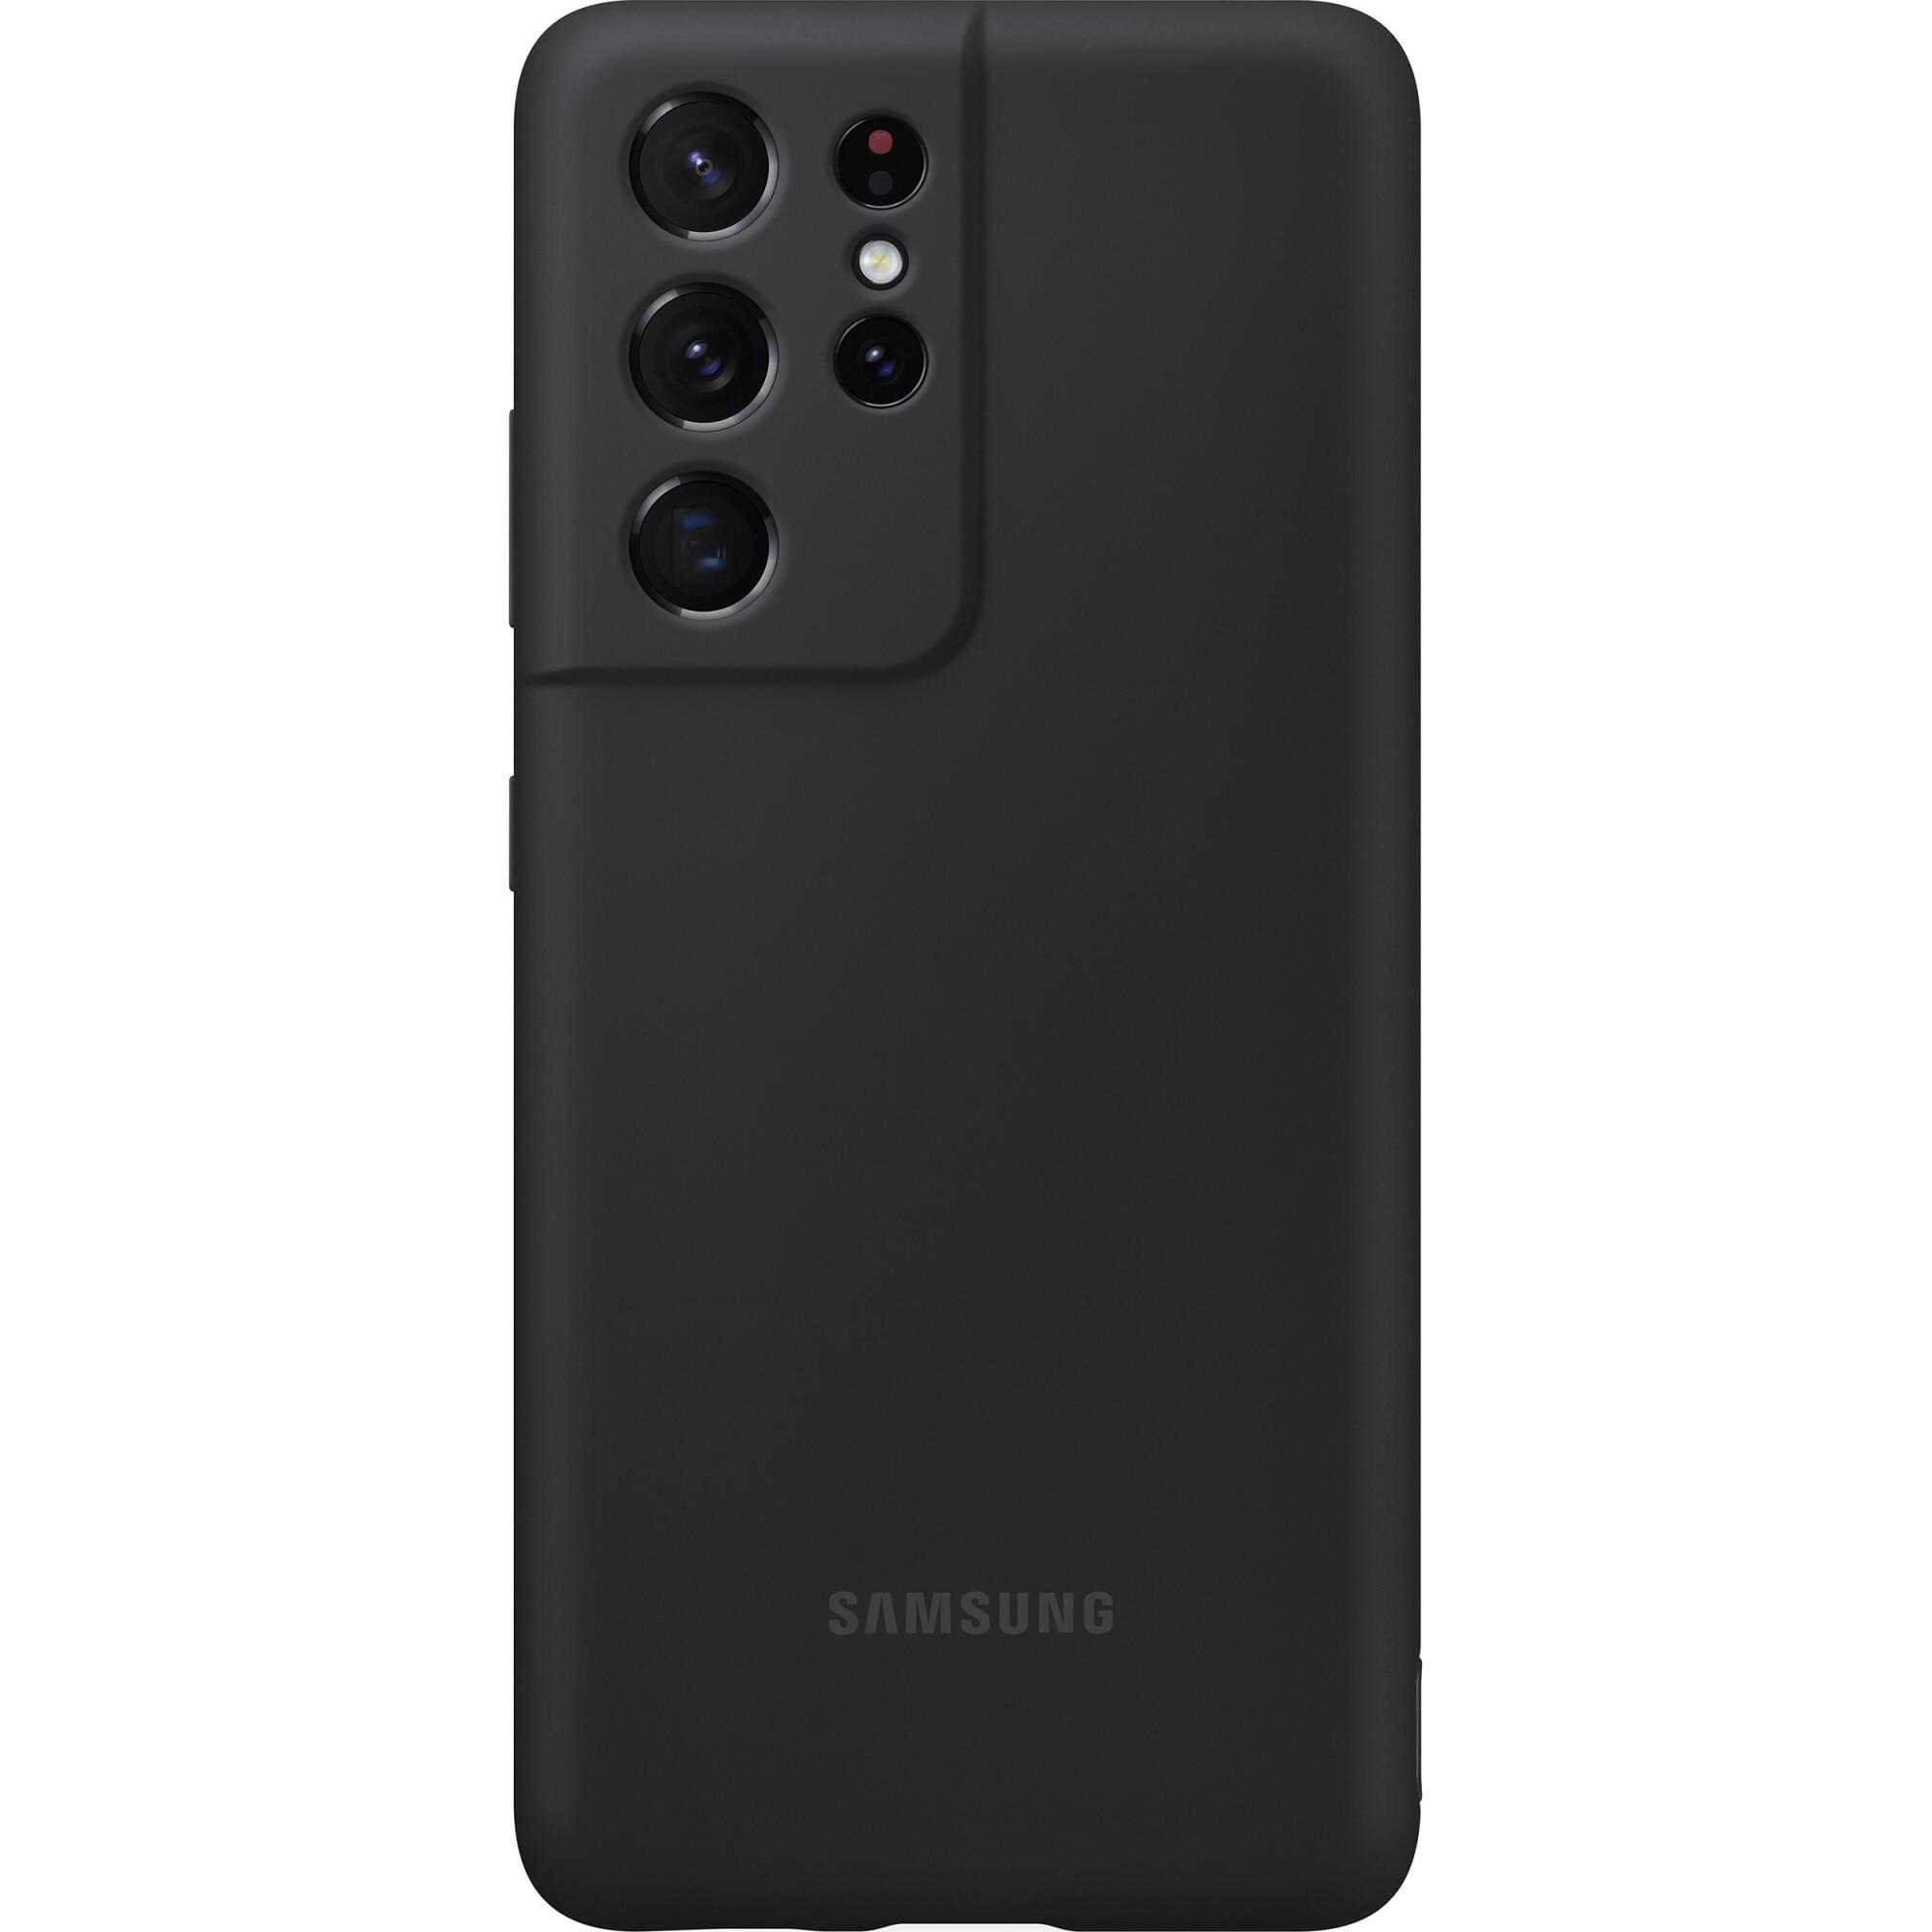 Fotografie Husa de protectie Samsung Silicone Cover pentru S21 Ultra, Black